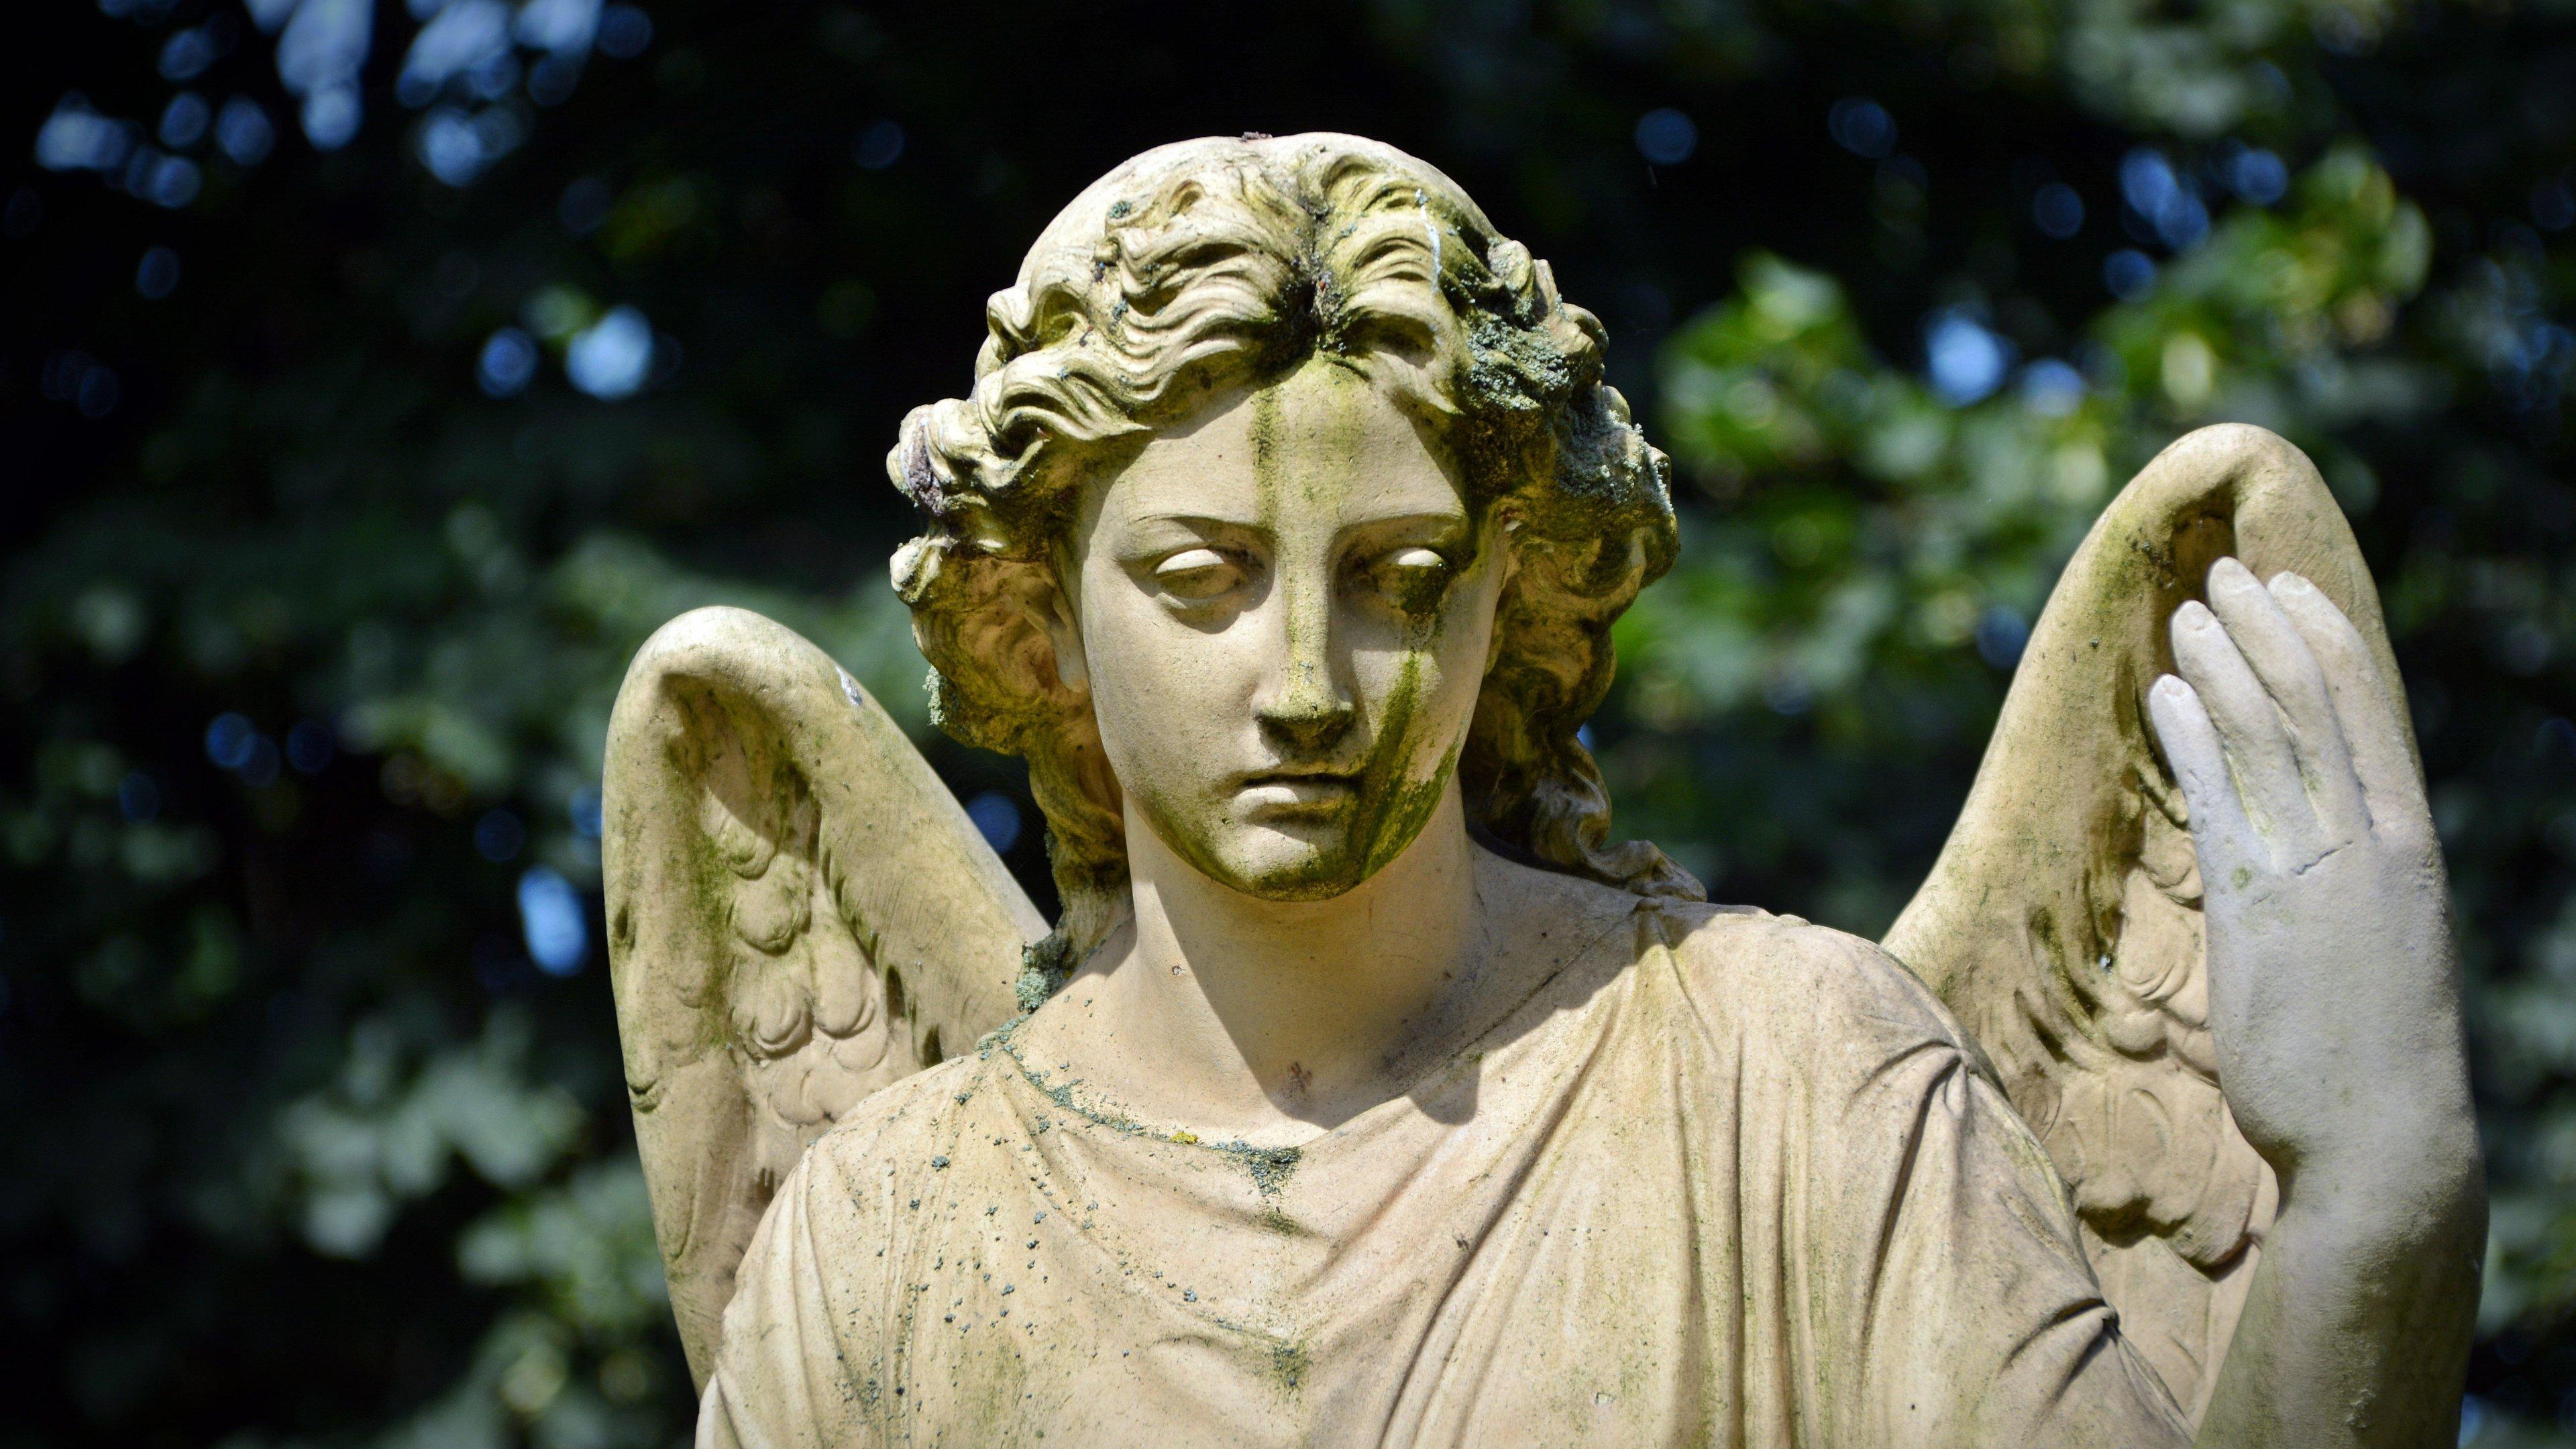 angel statue wallpaper - mobile & desktop background